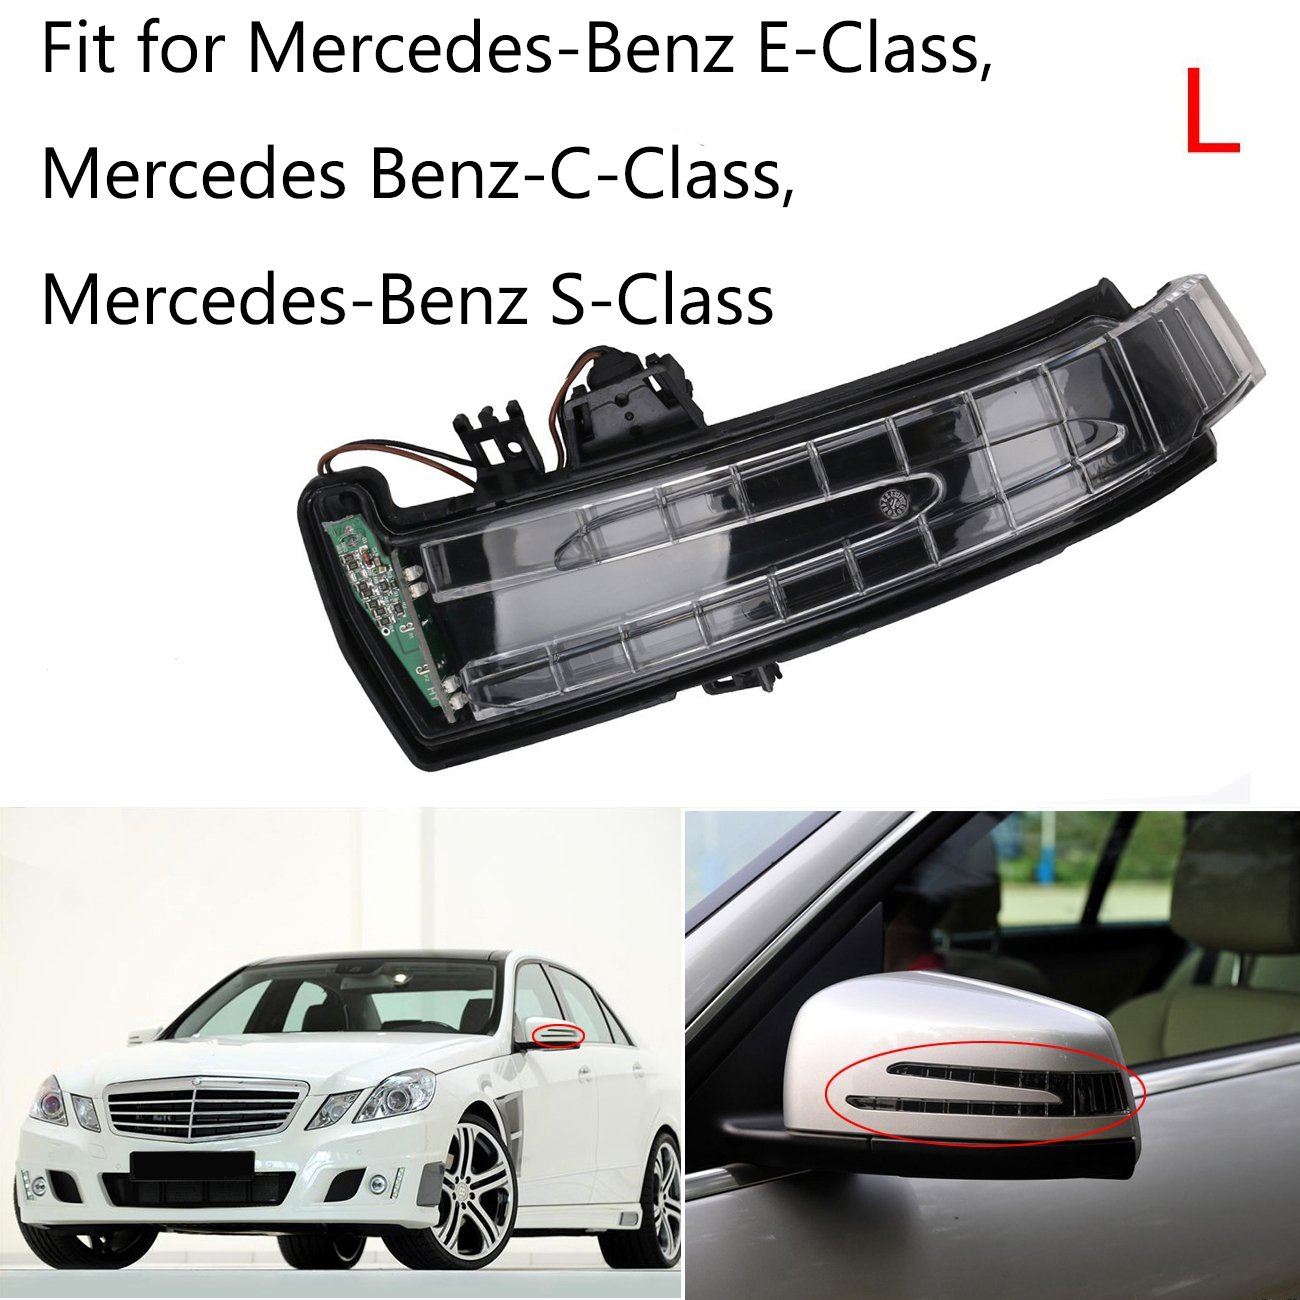 Auto Au/ßenspiegel Indikator,BOXATDOOR Links Seite Spiegel Lampe f/ür E-Klasse